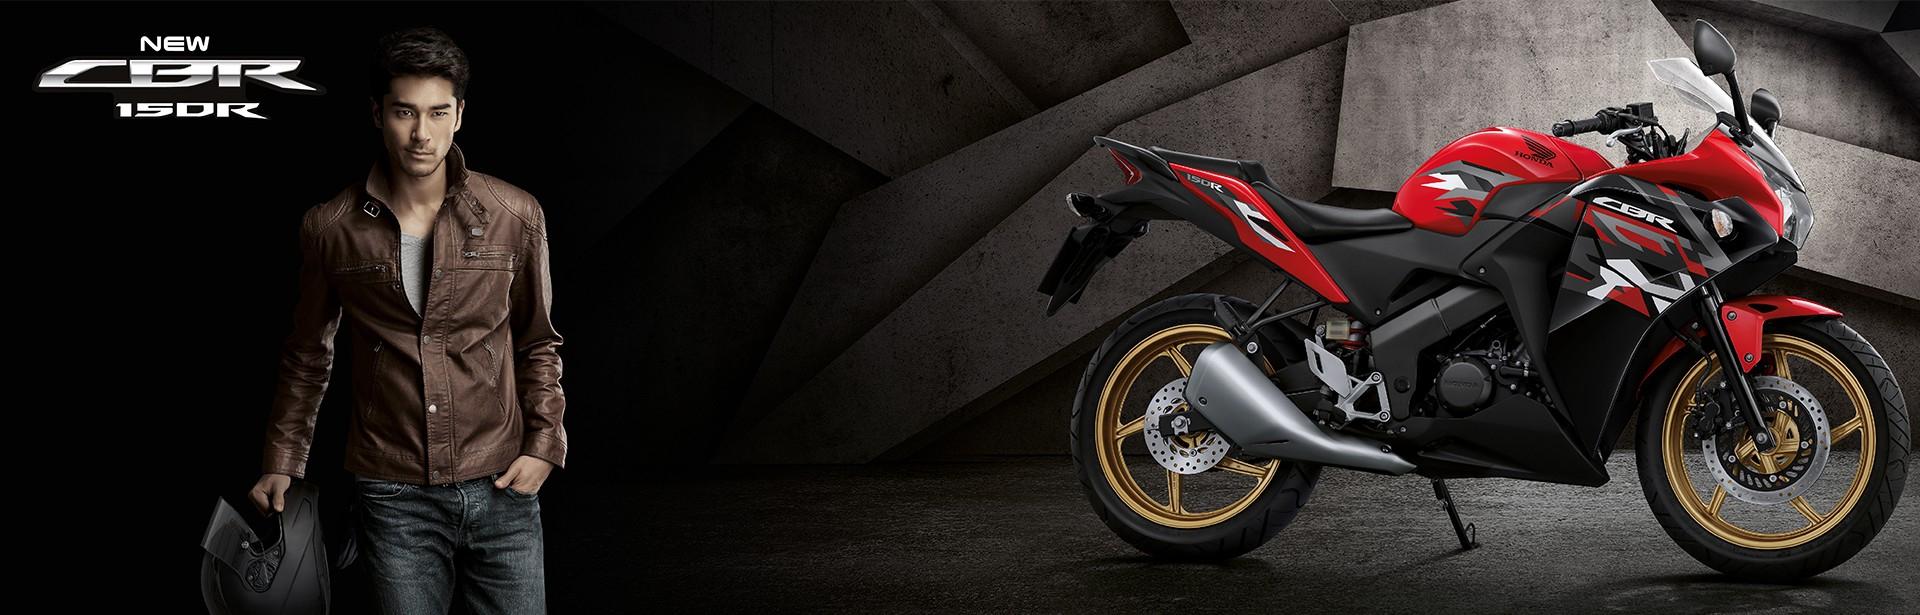 Honda-Motorcycle-มอเตอร์ไซค์-ฮอนด้า-cbr150r-SPORT-SPIRIT